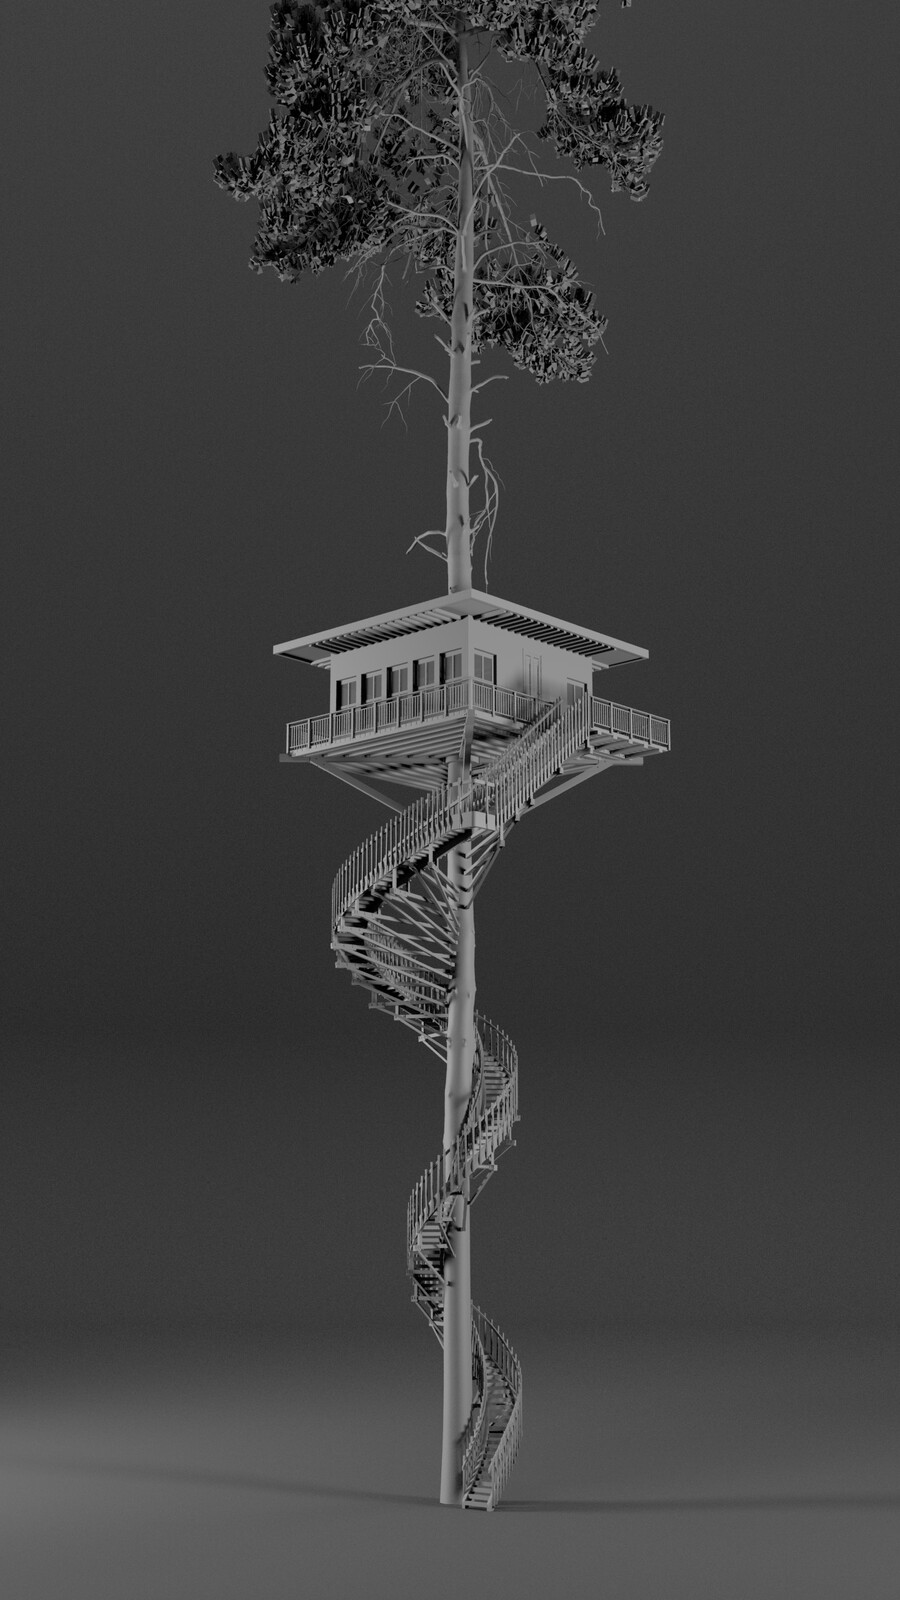 Procedural Tree House - Houdini Digital Asset